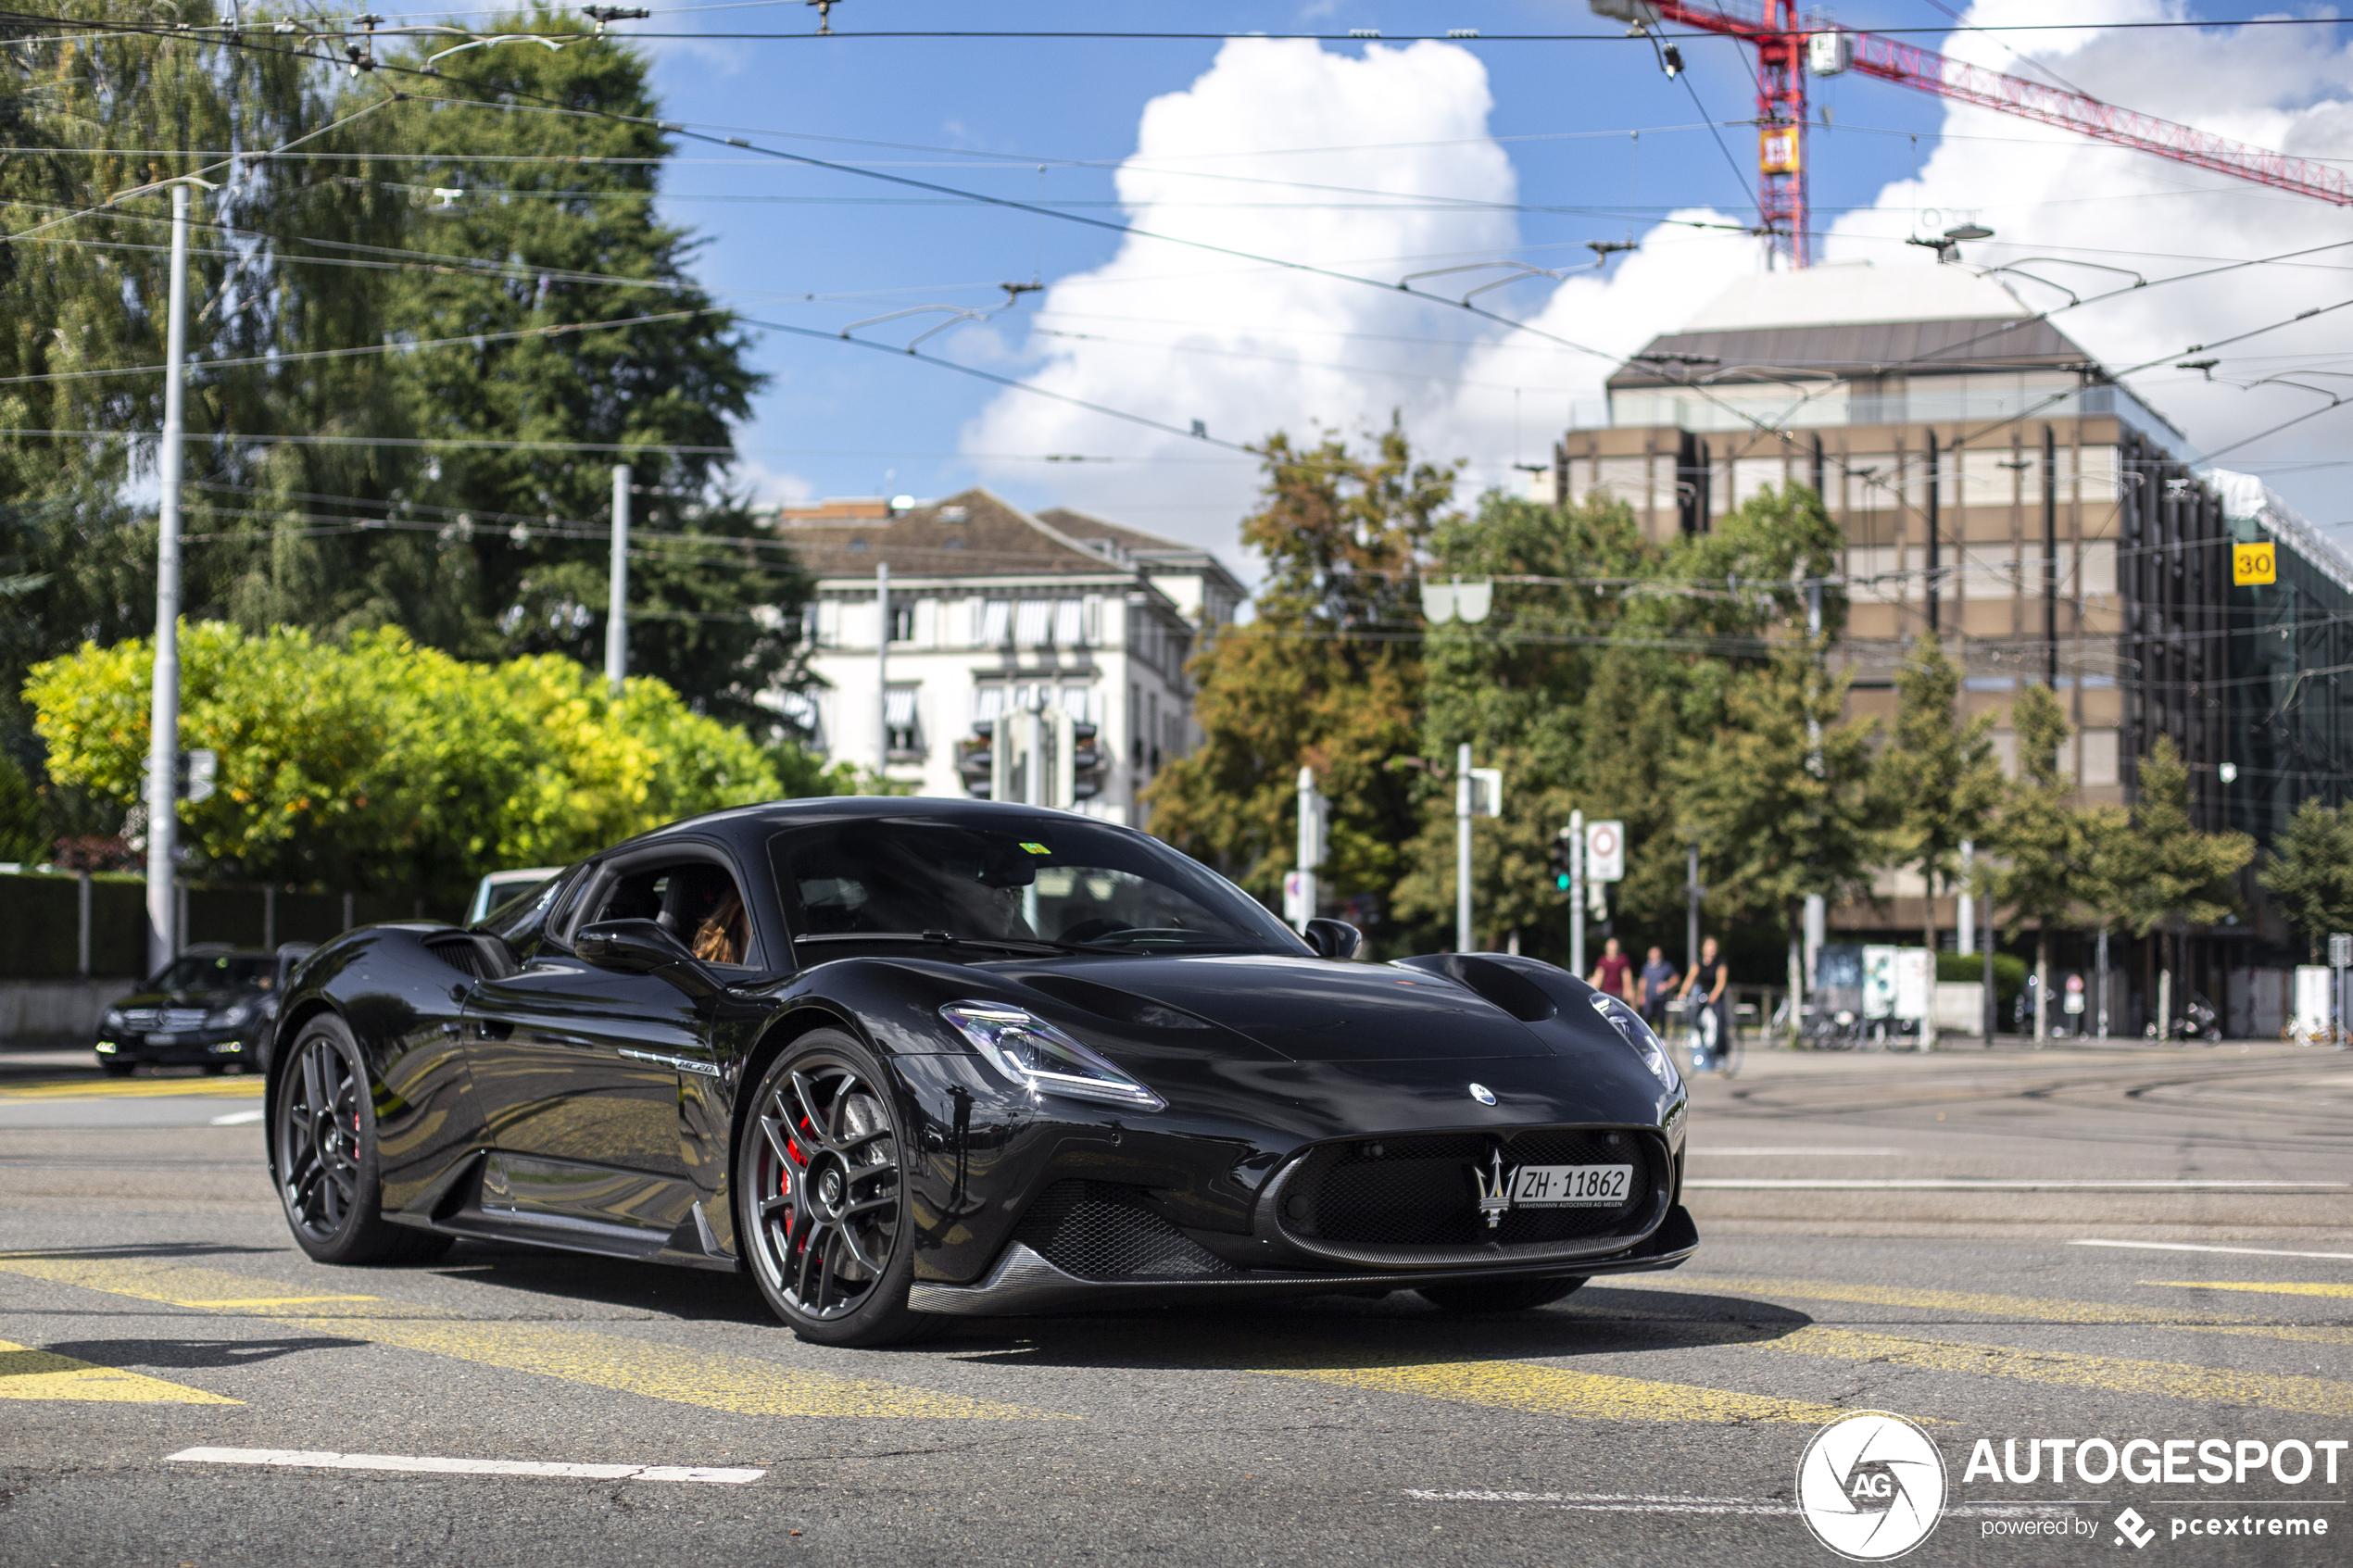 Maserati MC20 shows up in Zürich